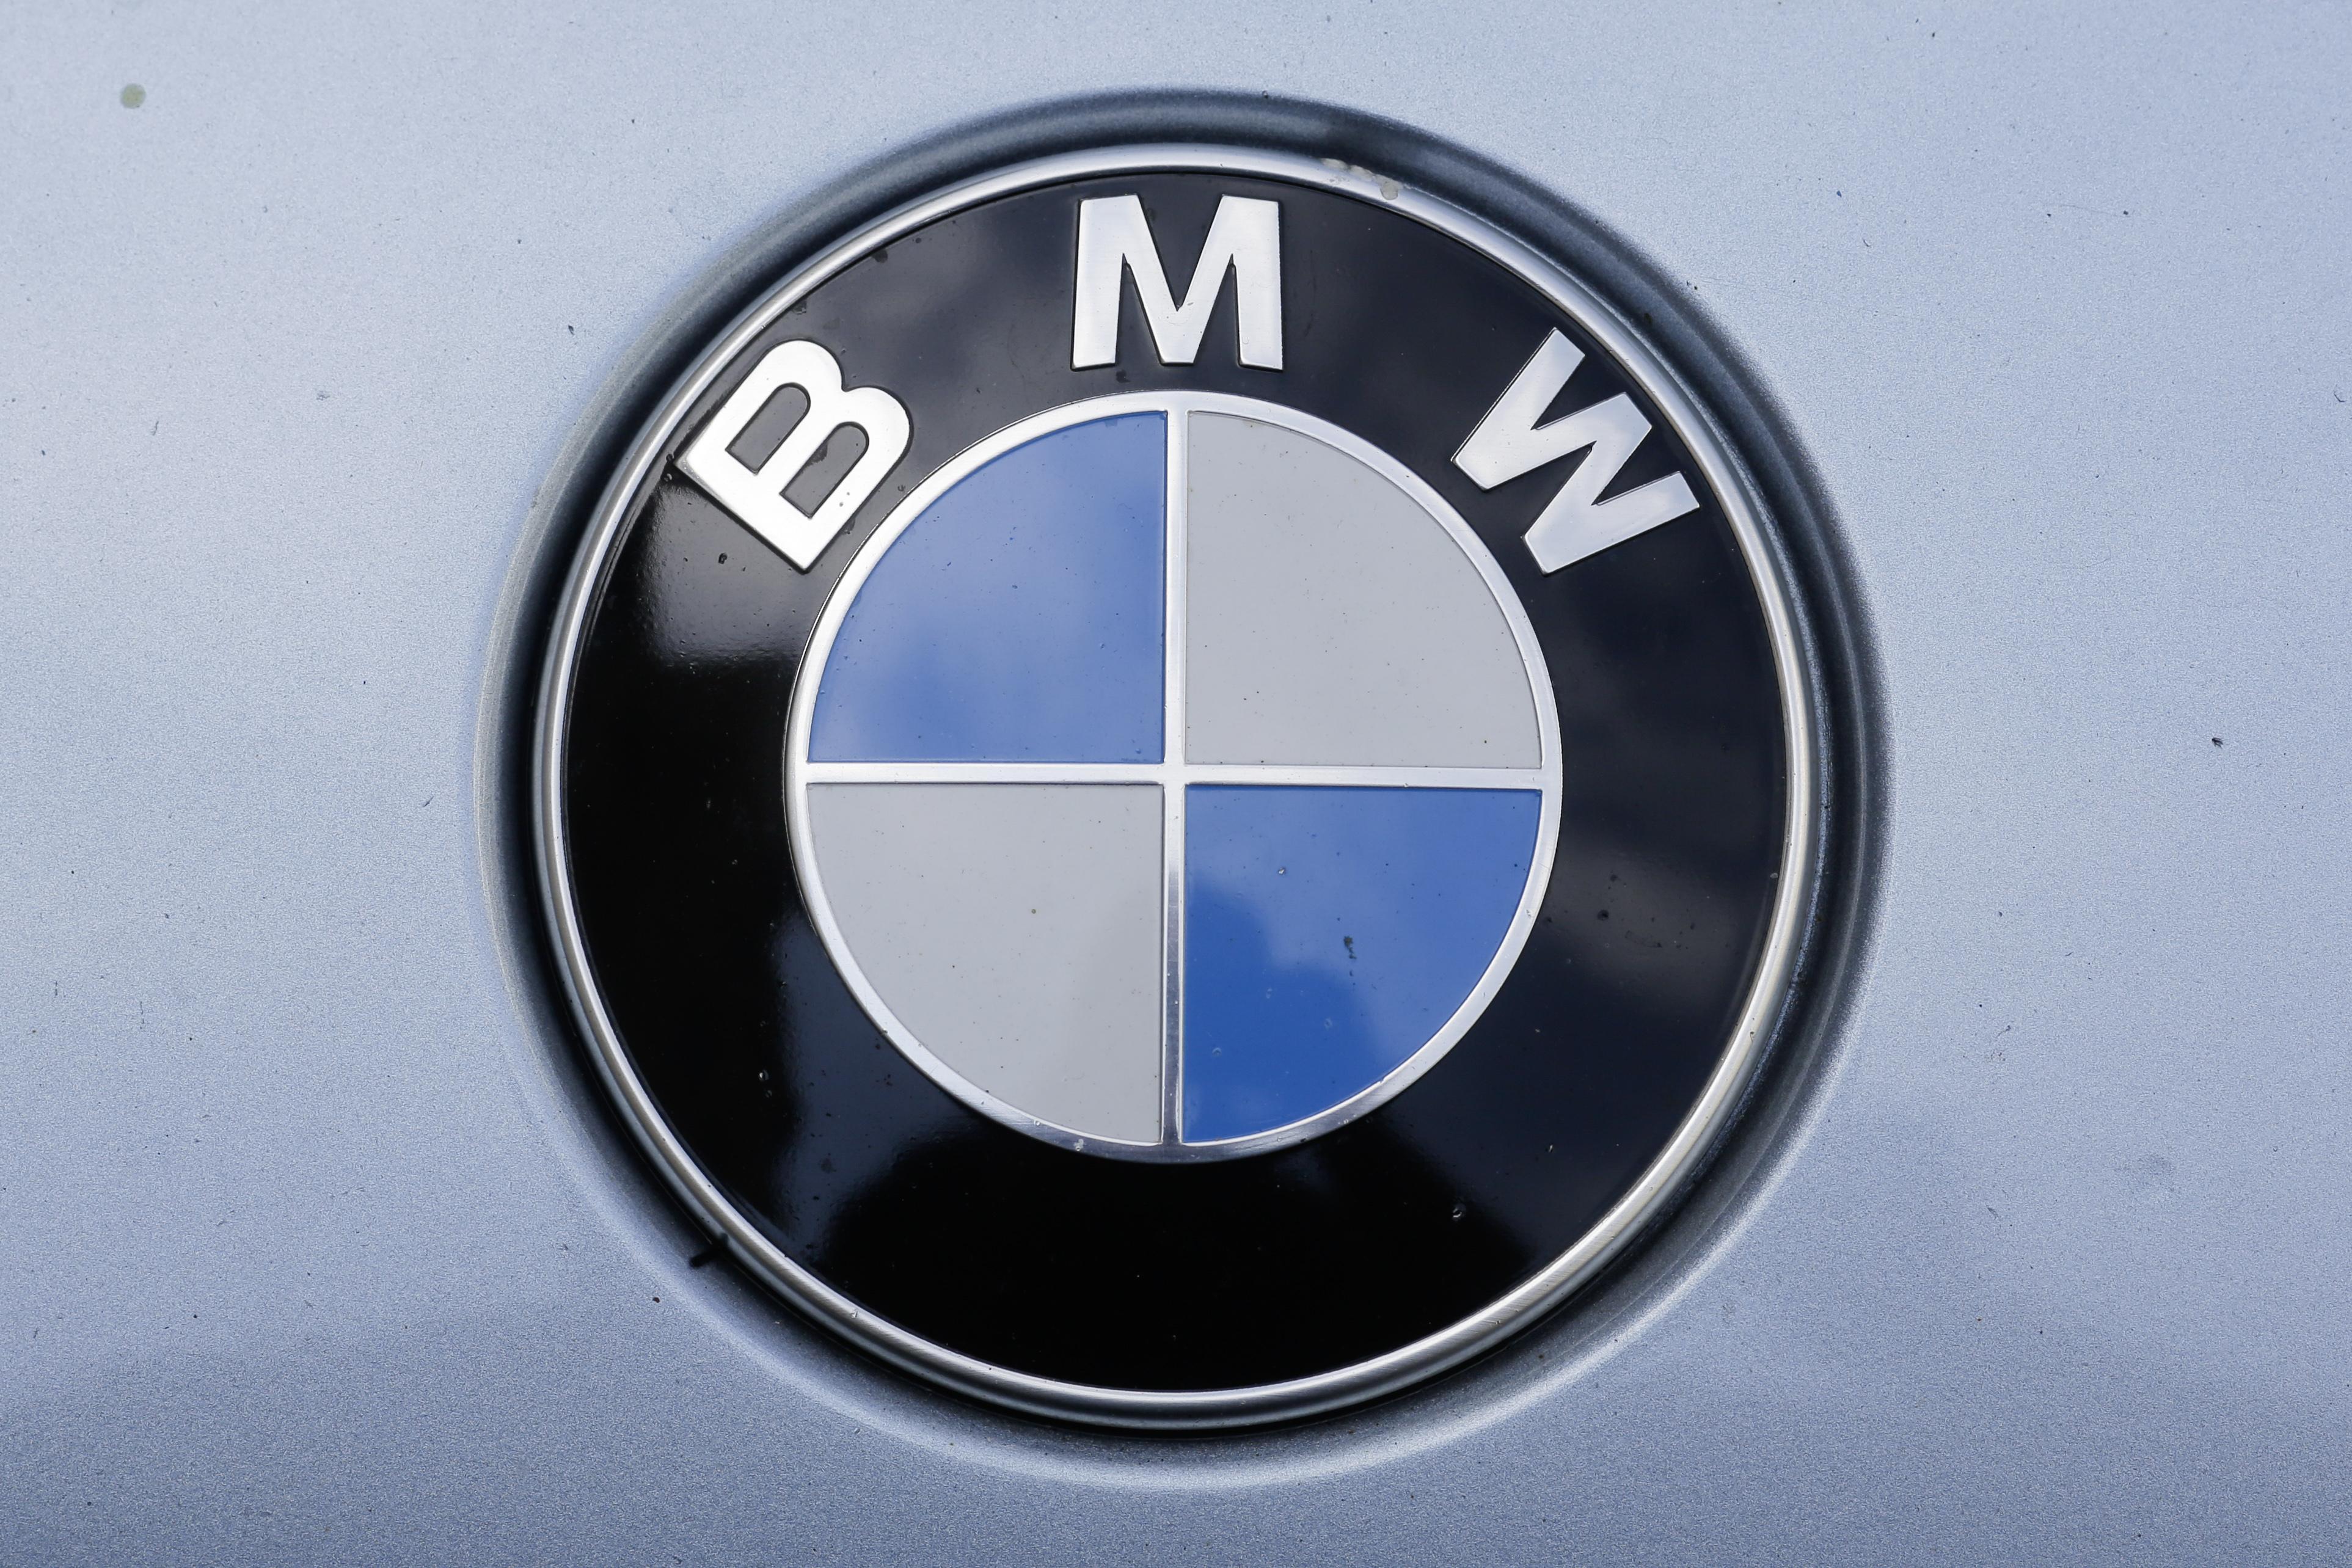 1 2017 Photo The Brand Logo Of German Car Maker Bmw